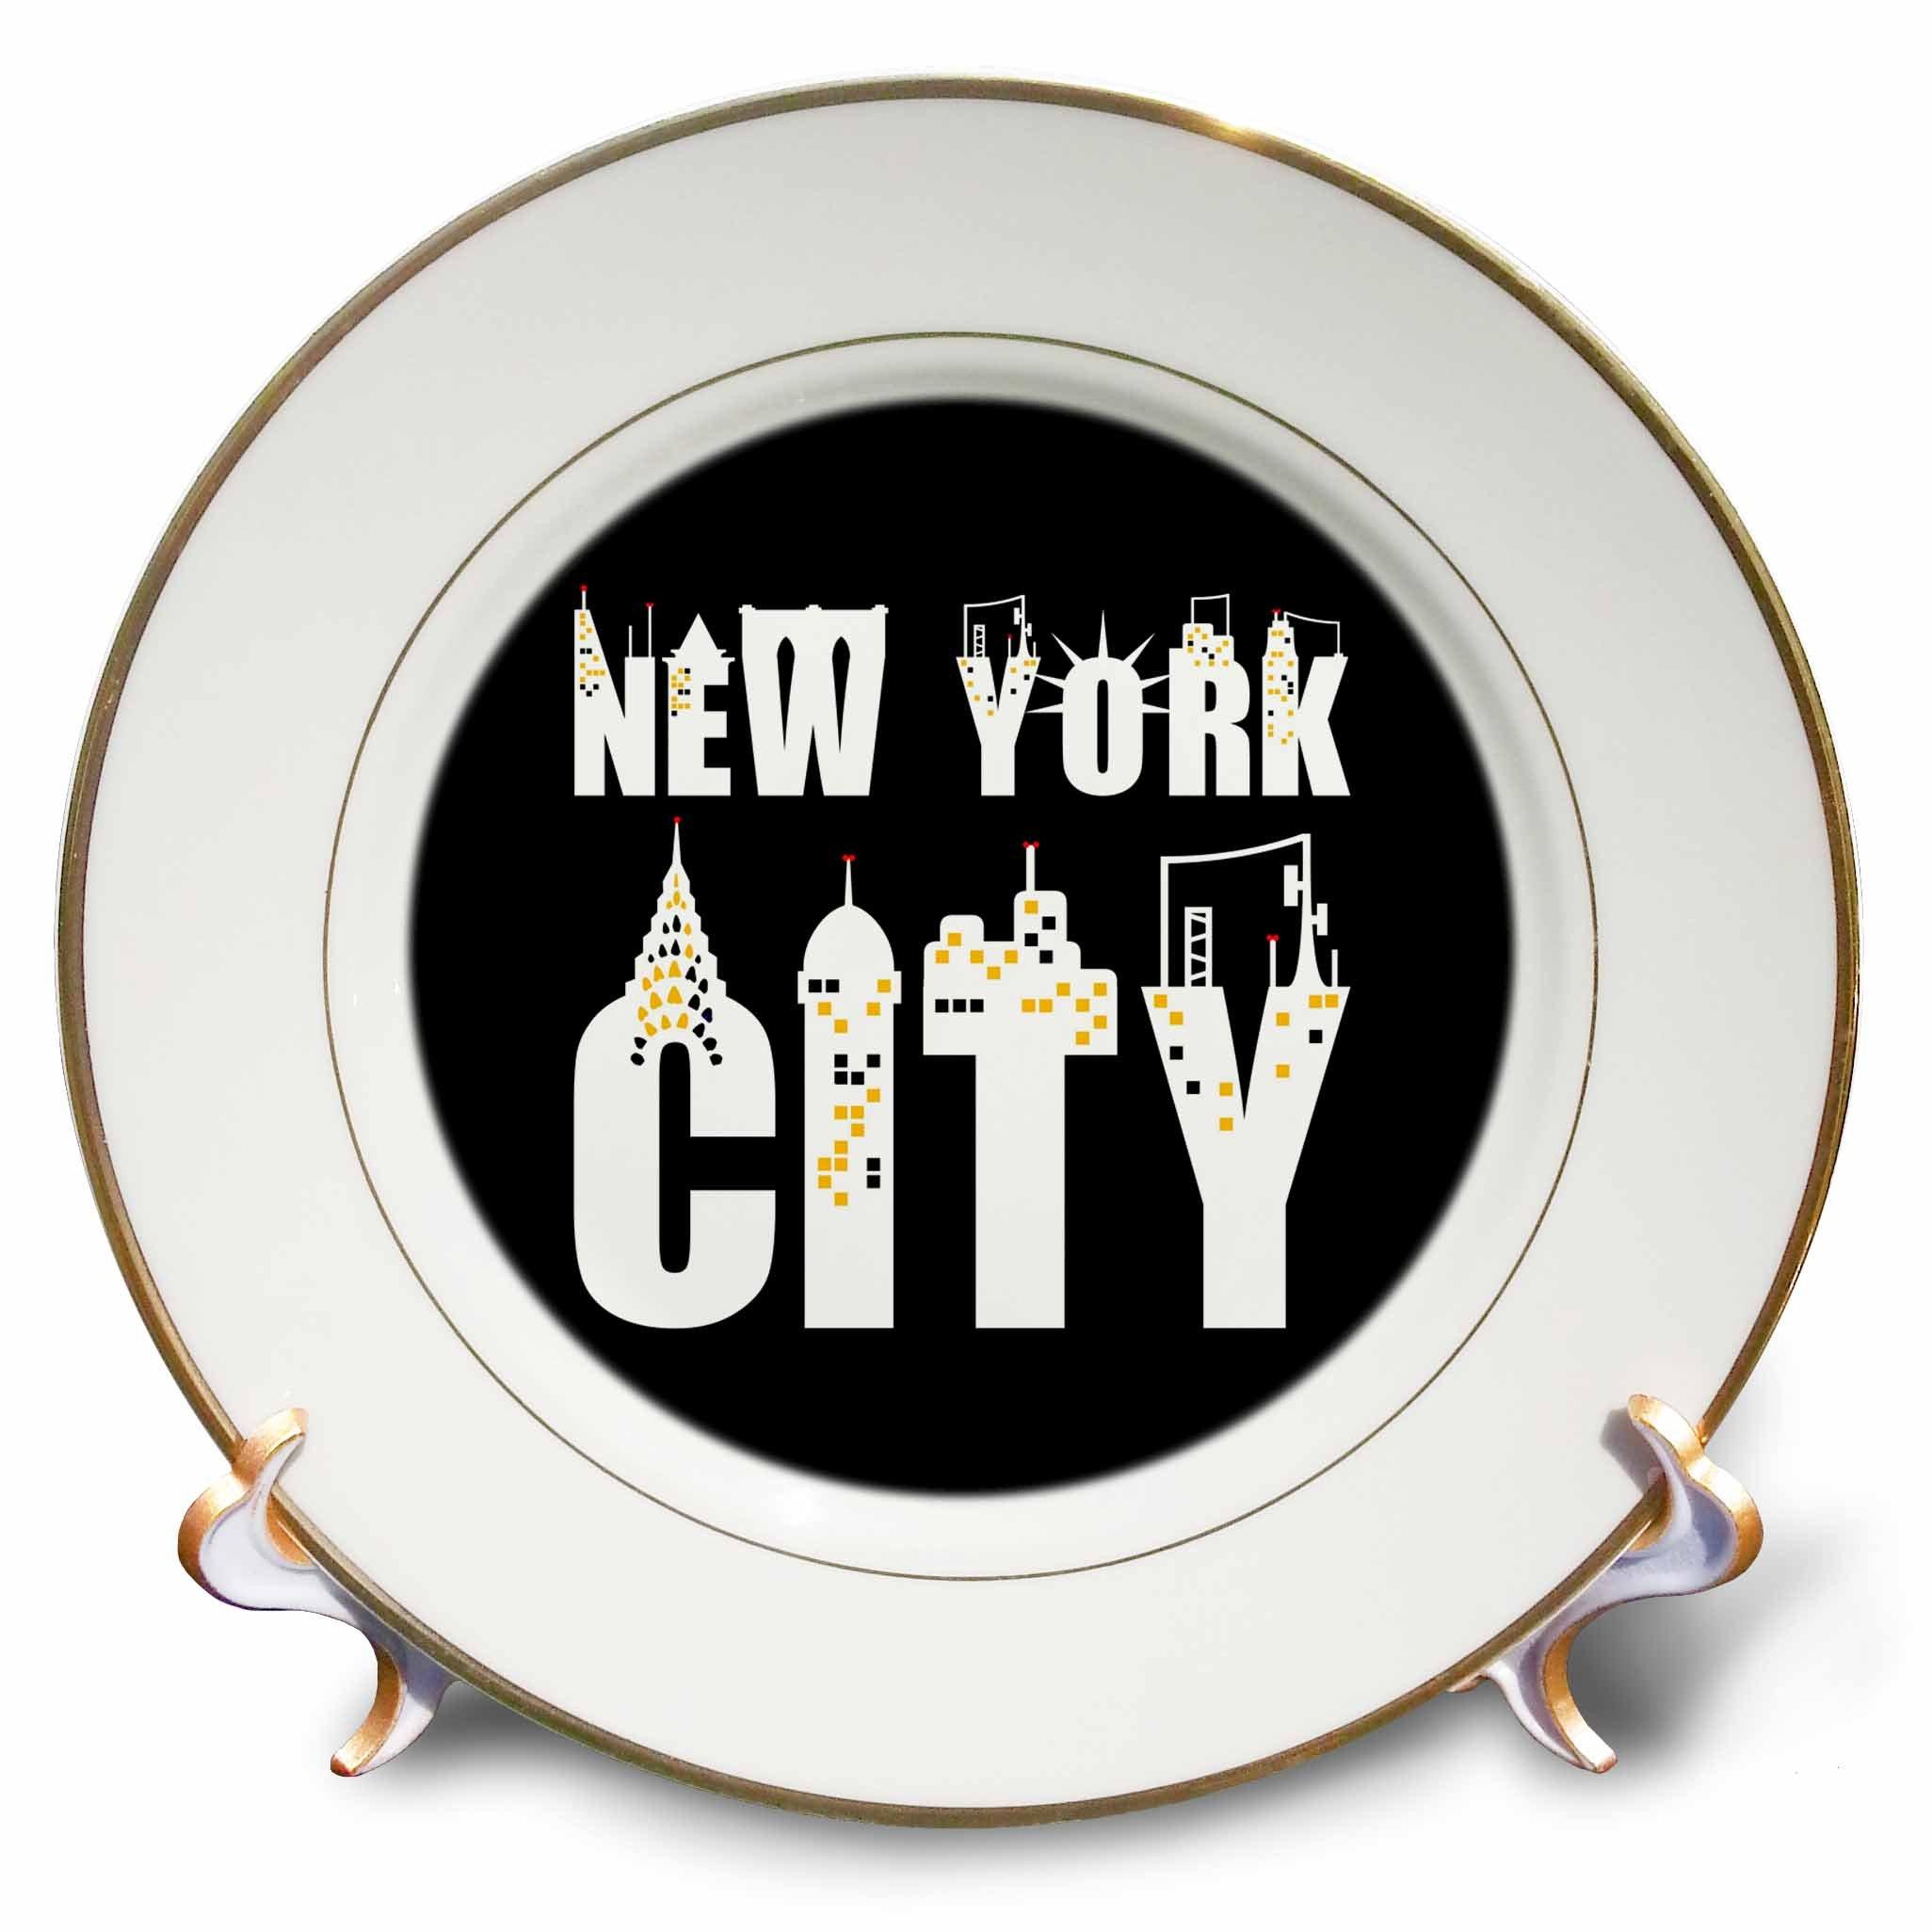 3dRose Alexis Design - American Cities - Stylish text New York City, landmarks, shining windows on black - 8 inch Porcelain Plate (cp_286454_1)